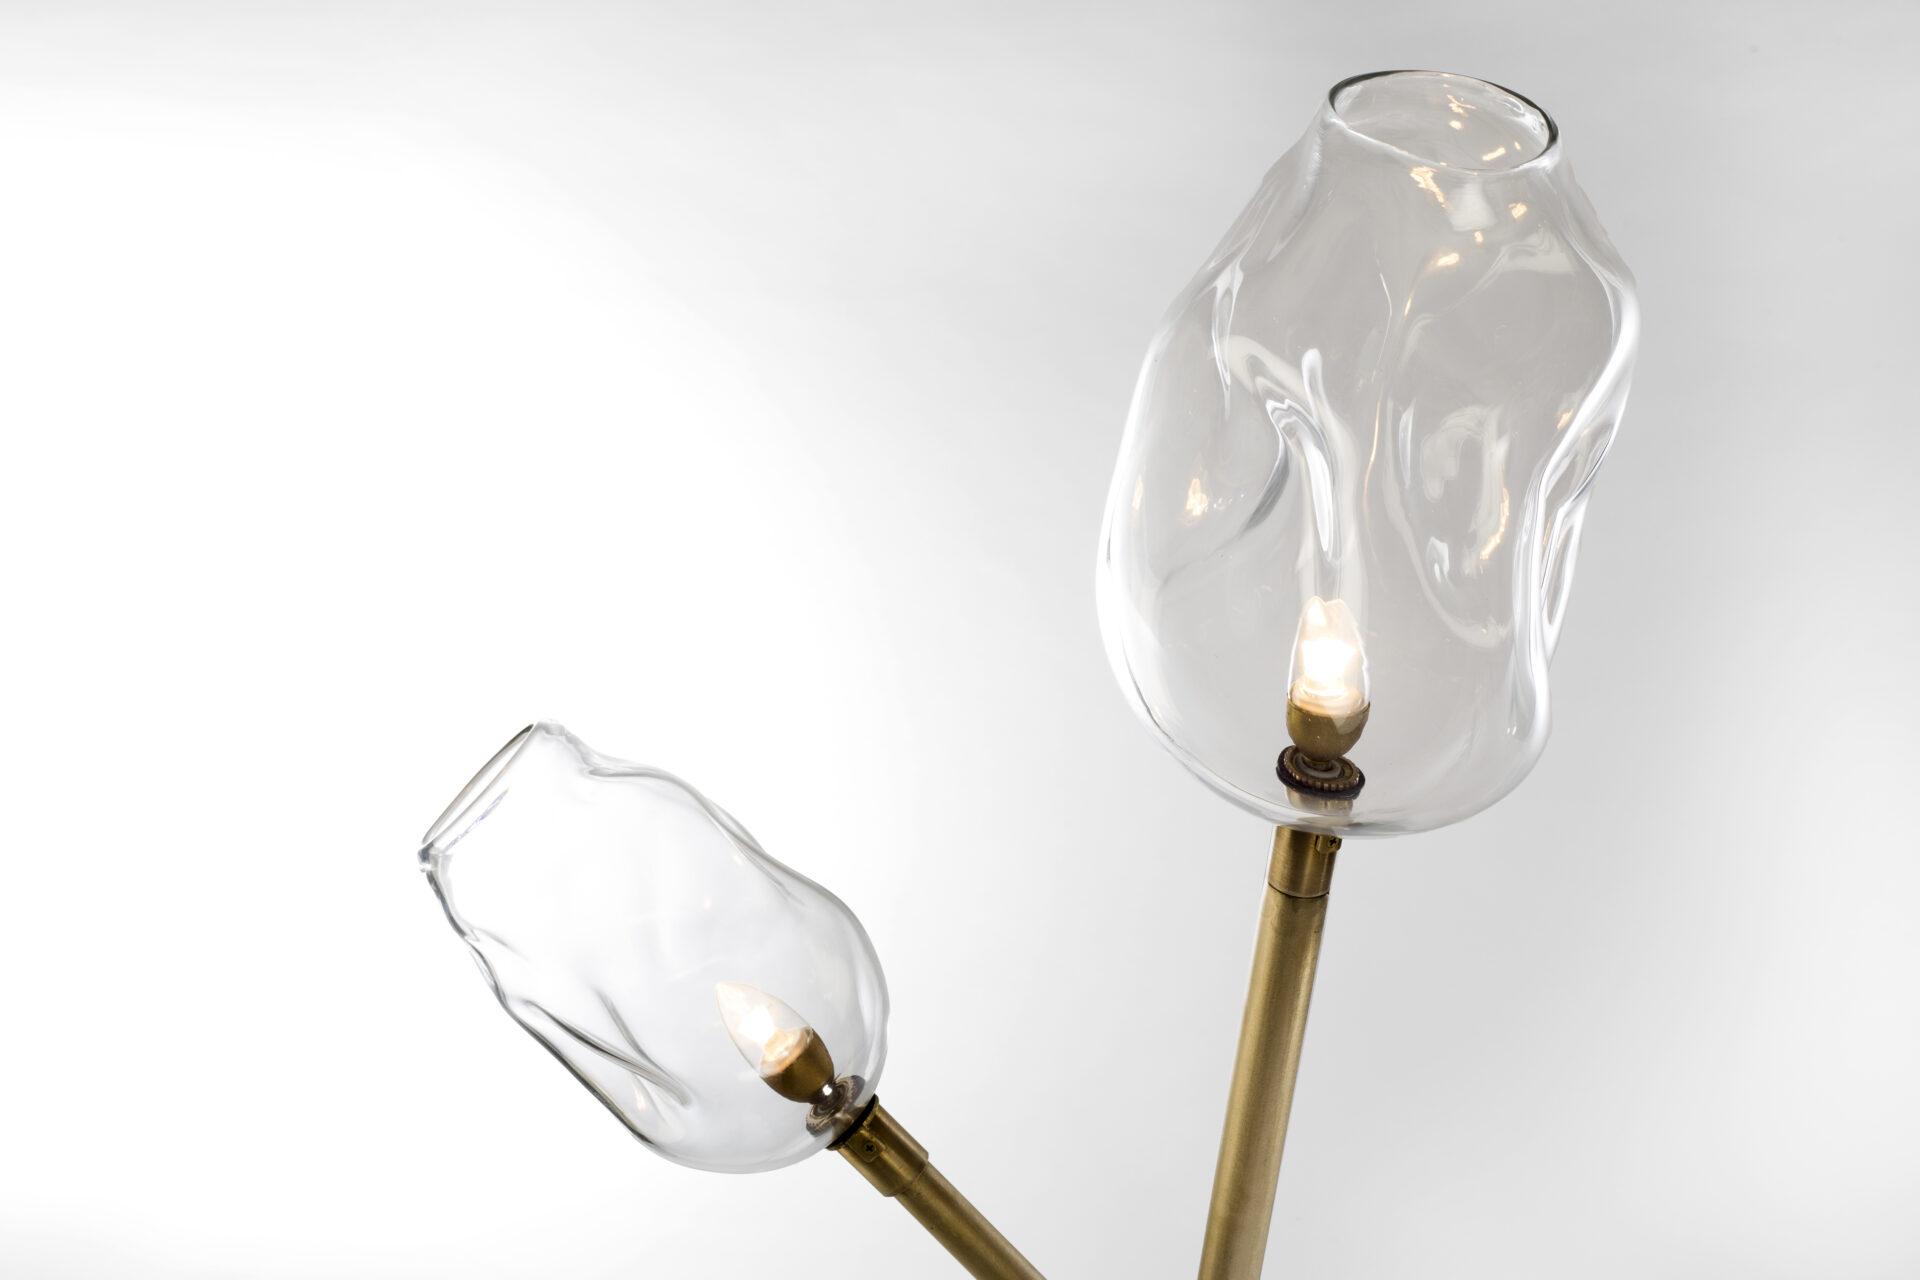 newest d6f68 0e501 Au Karanto Blown Glass Floor Lamp